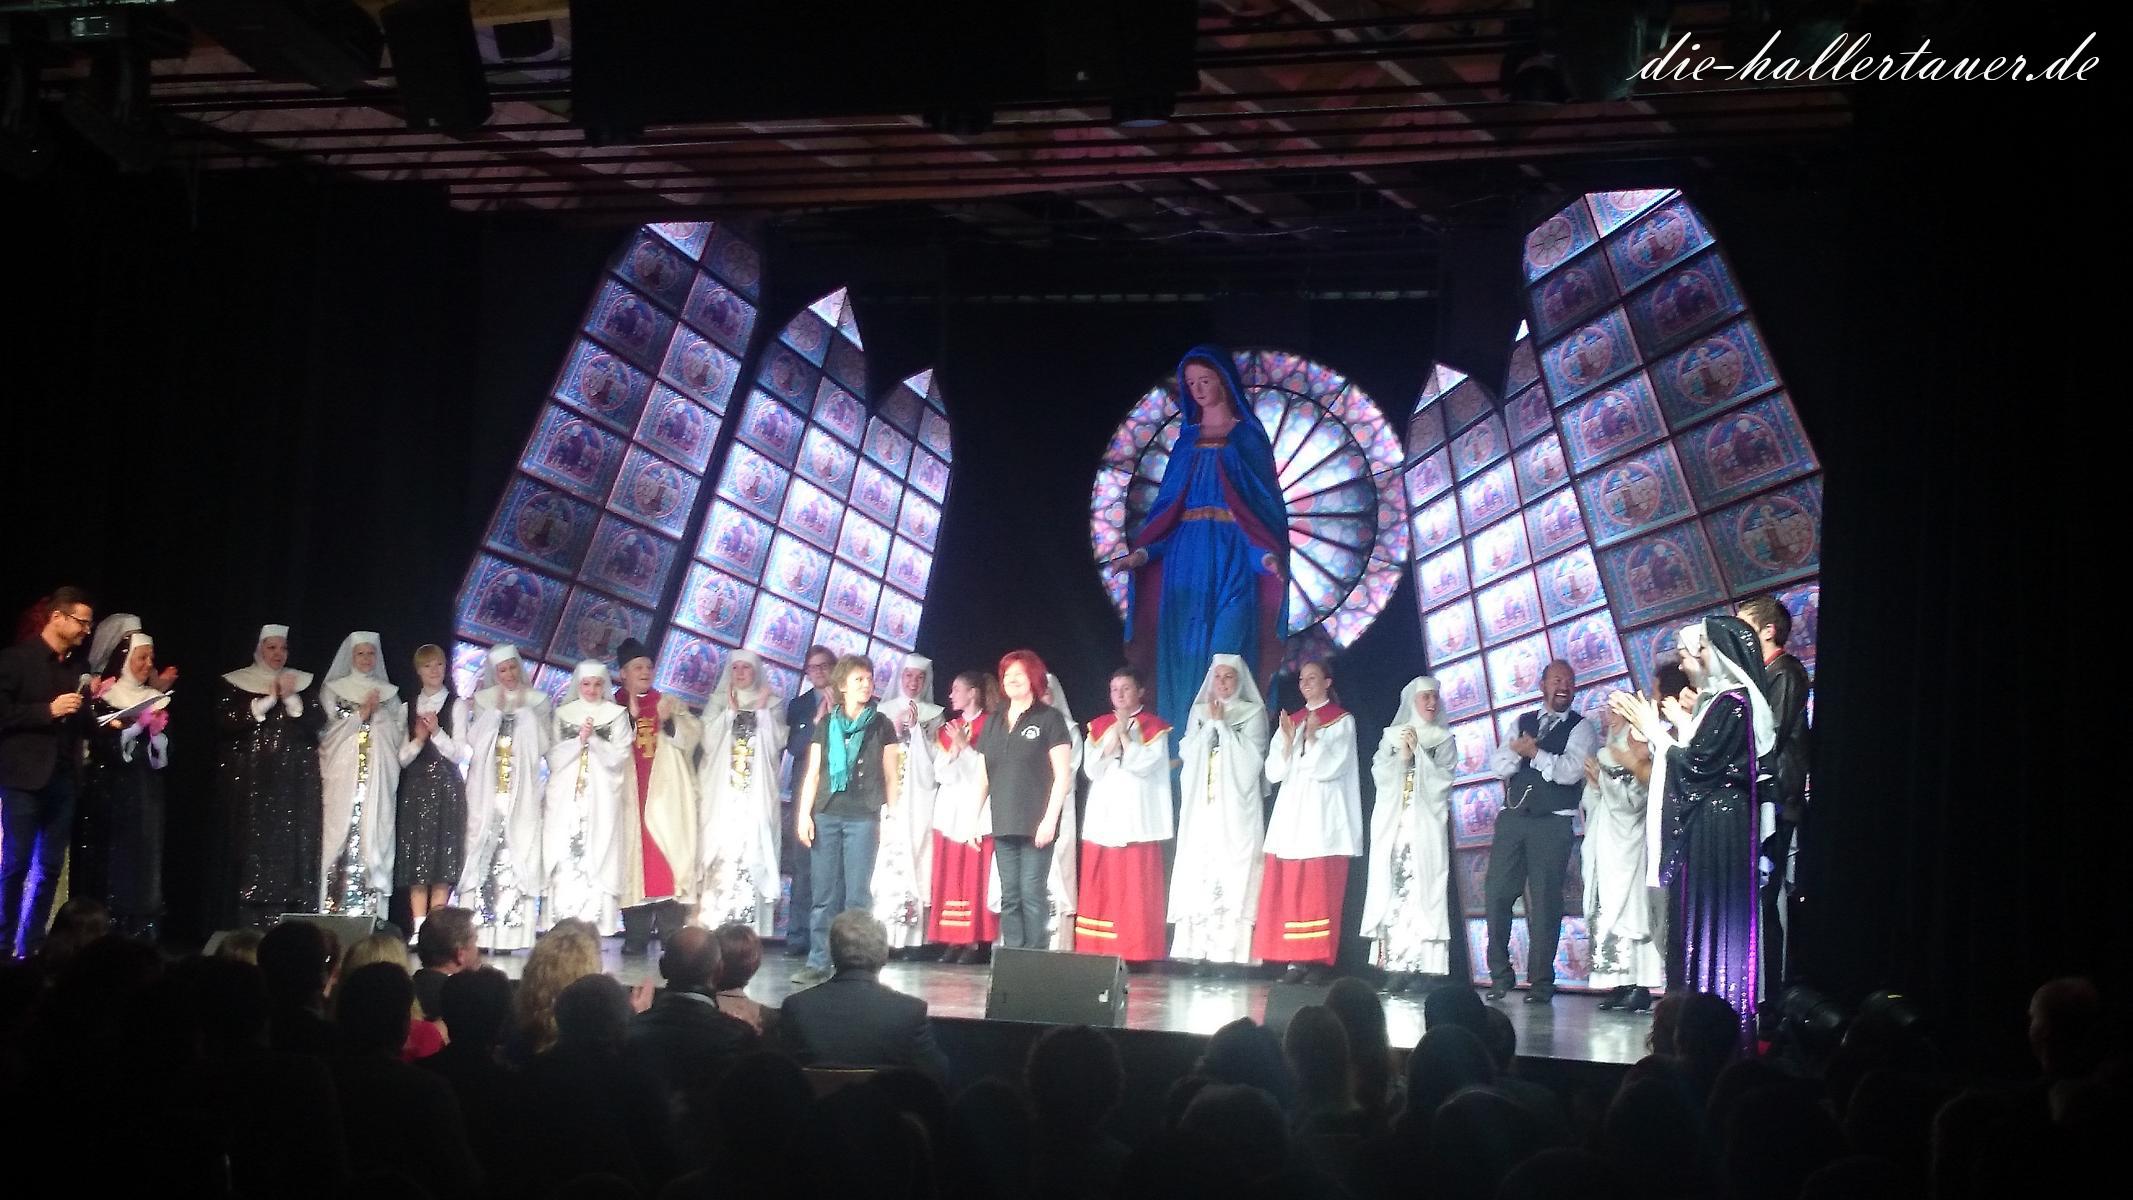 Sister Act Musical Nandlstadt